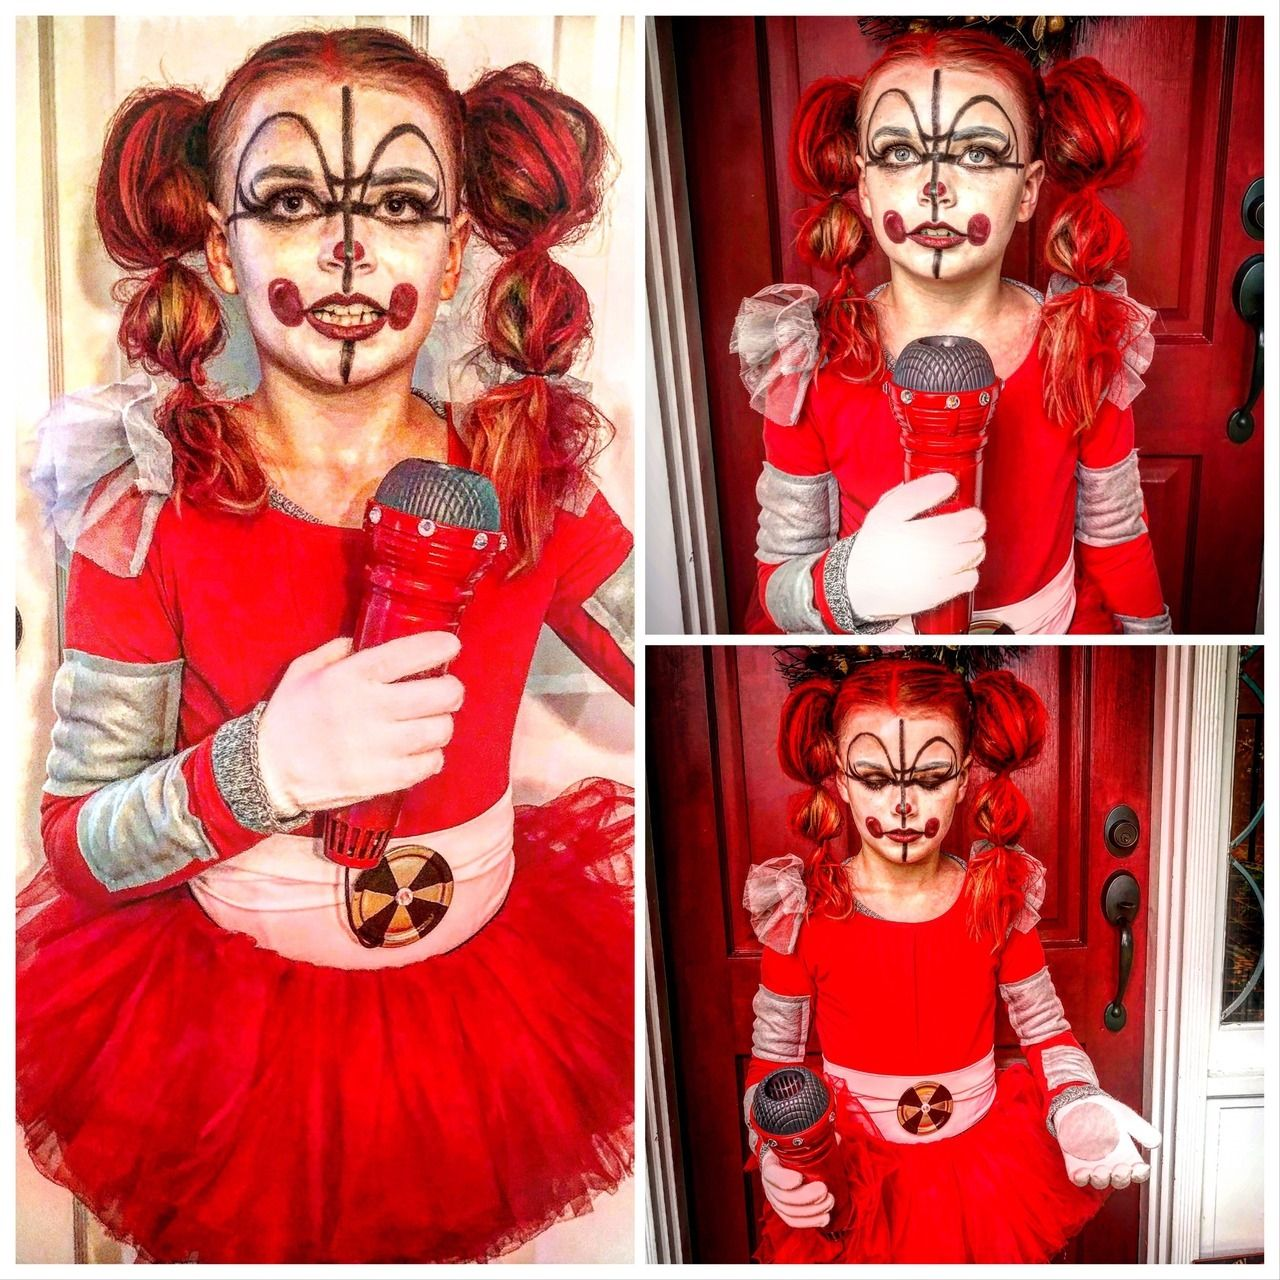 Circus Baby Costume Fnaf Sister Location Diy Circus Baby Costume Diy Baby Costumes Fnaf Costume Diy Halloween Costumes For Kids